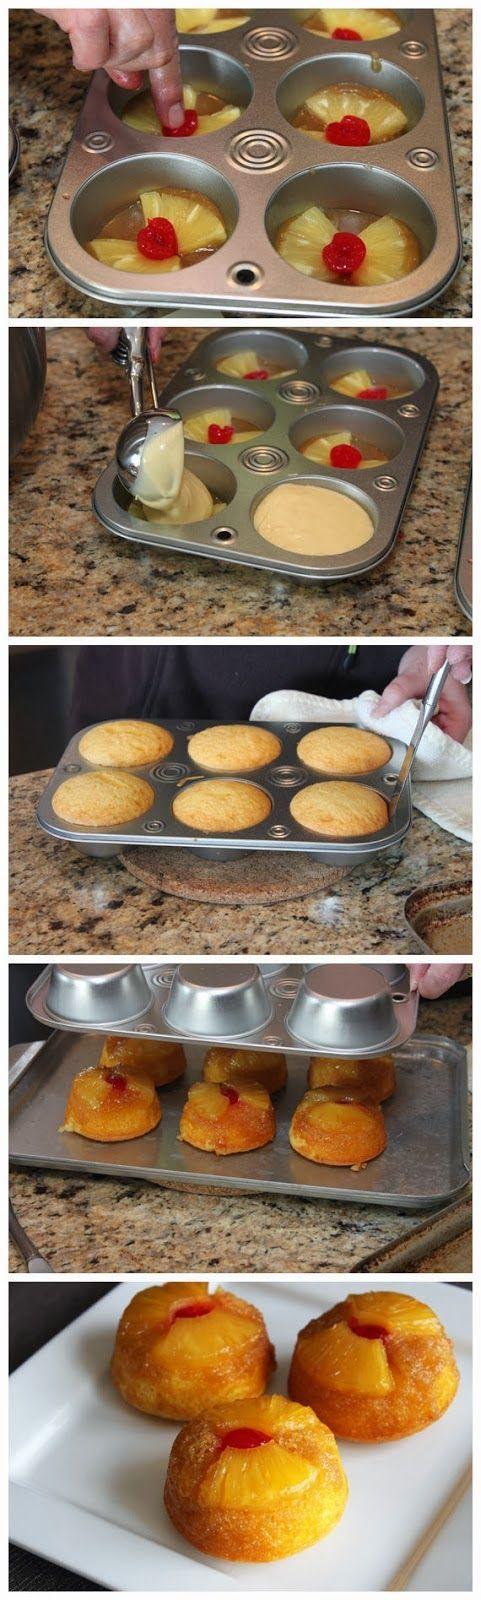 How Ho Pineapple Upside-Down Cupcakes